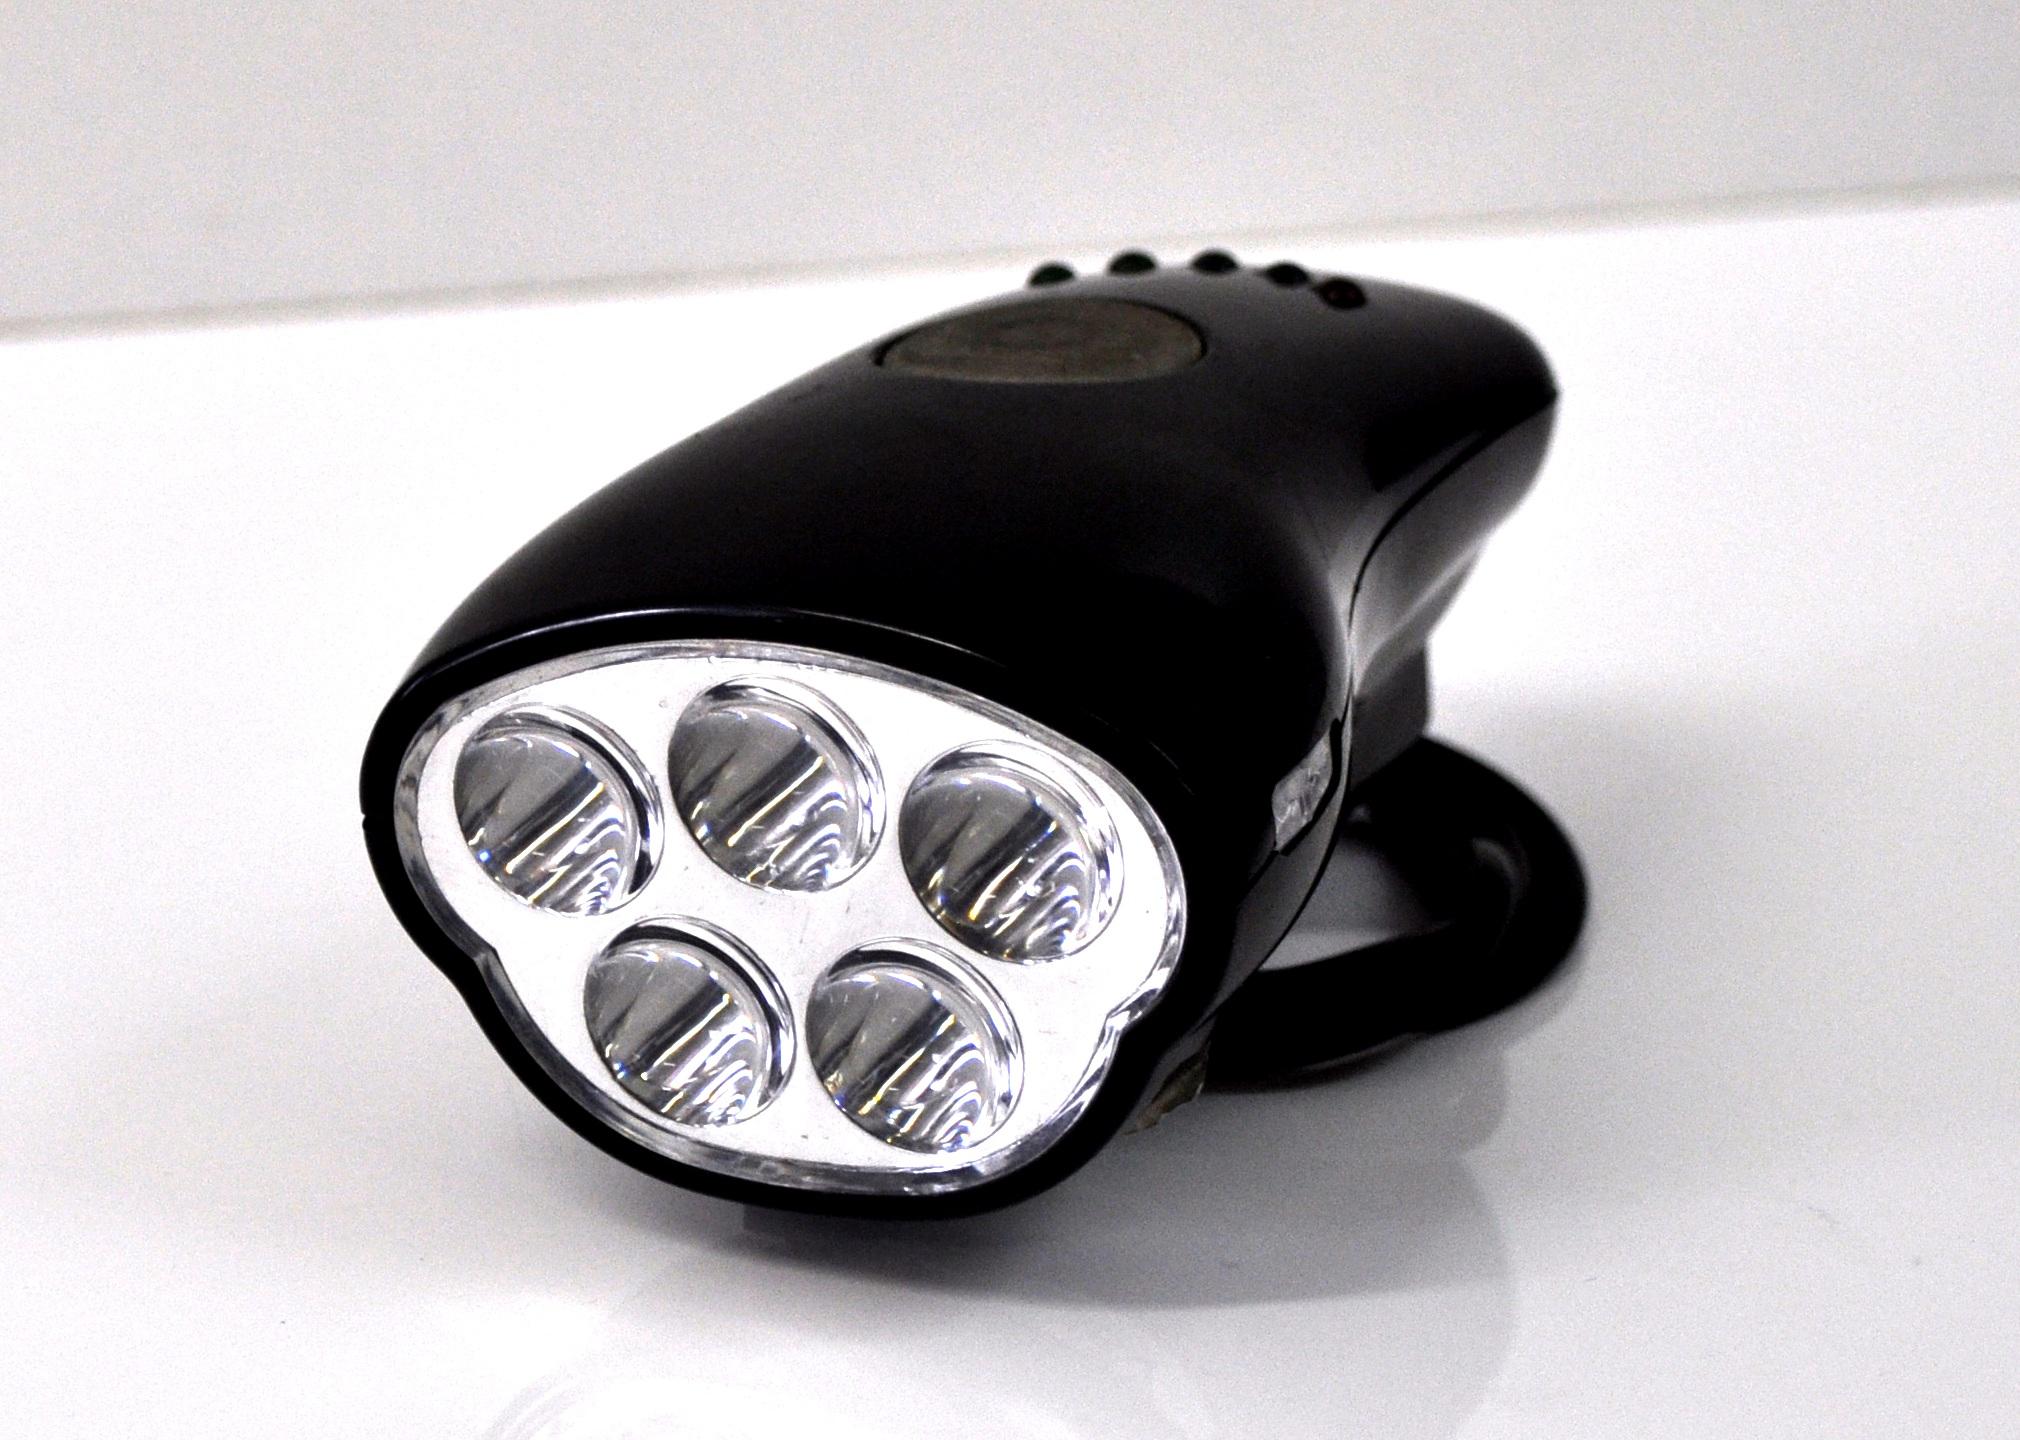 36v LED Combined Power Control & Front Light (Old Model Bikes)